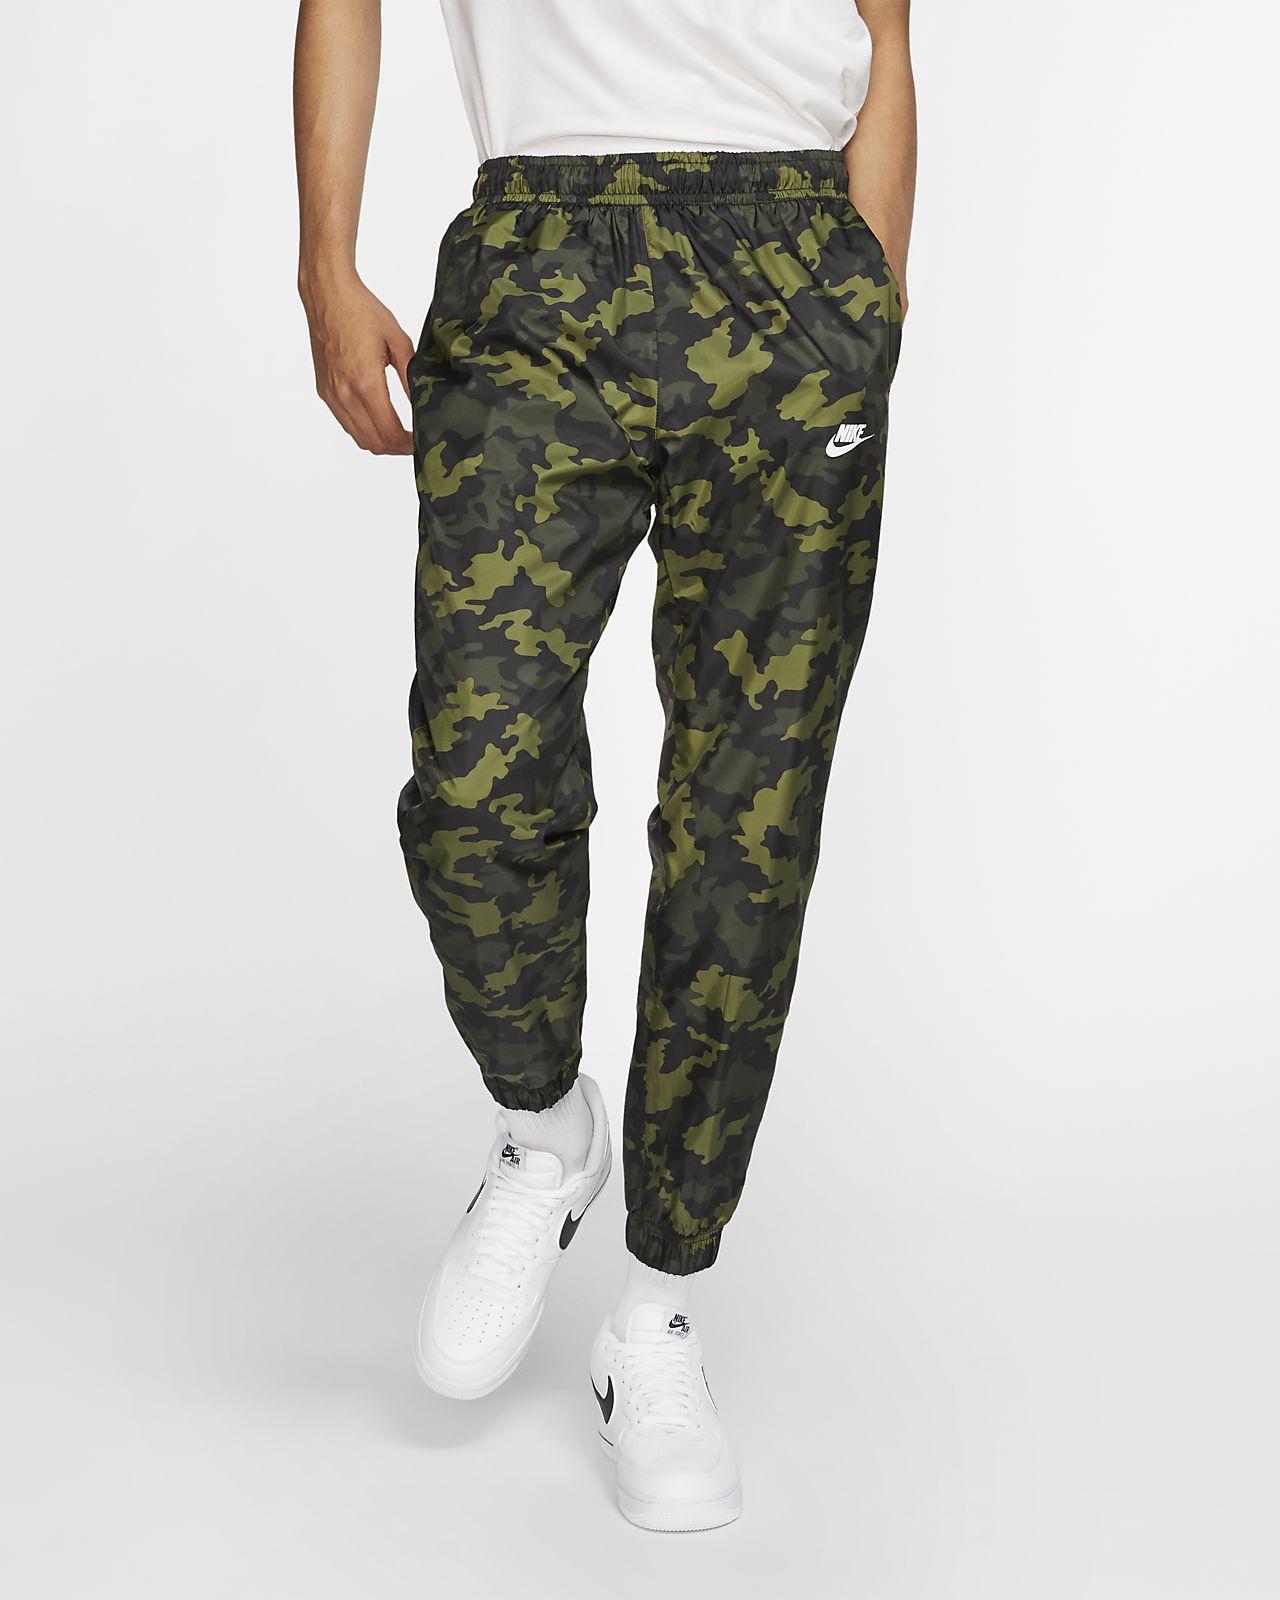 Nike Sportswear Geweven trainingsbroek met camouflageprint voor heren